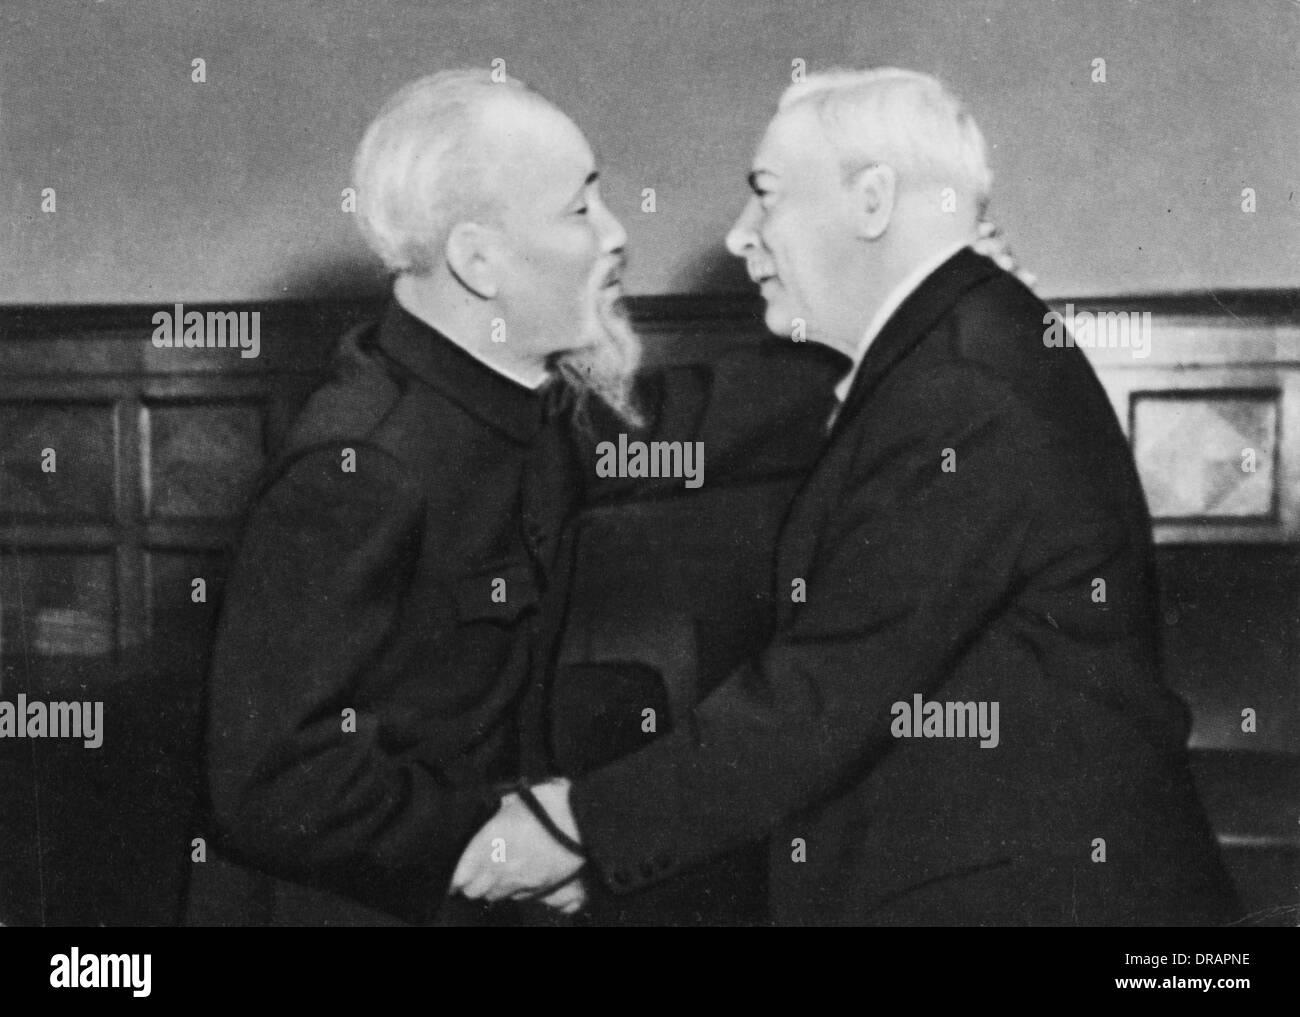 Meeting of Kliment Voroshilov and Ho Chi Minh - Stock Image